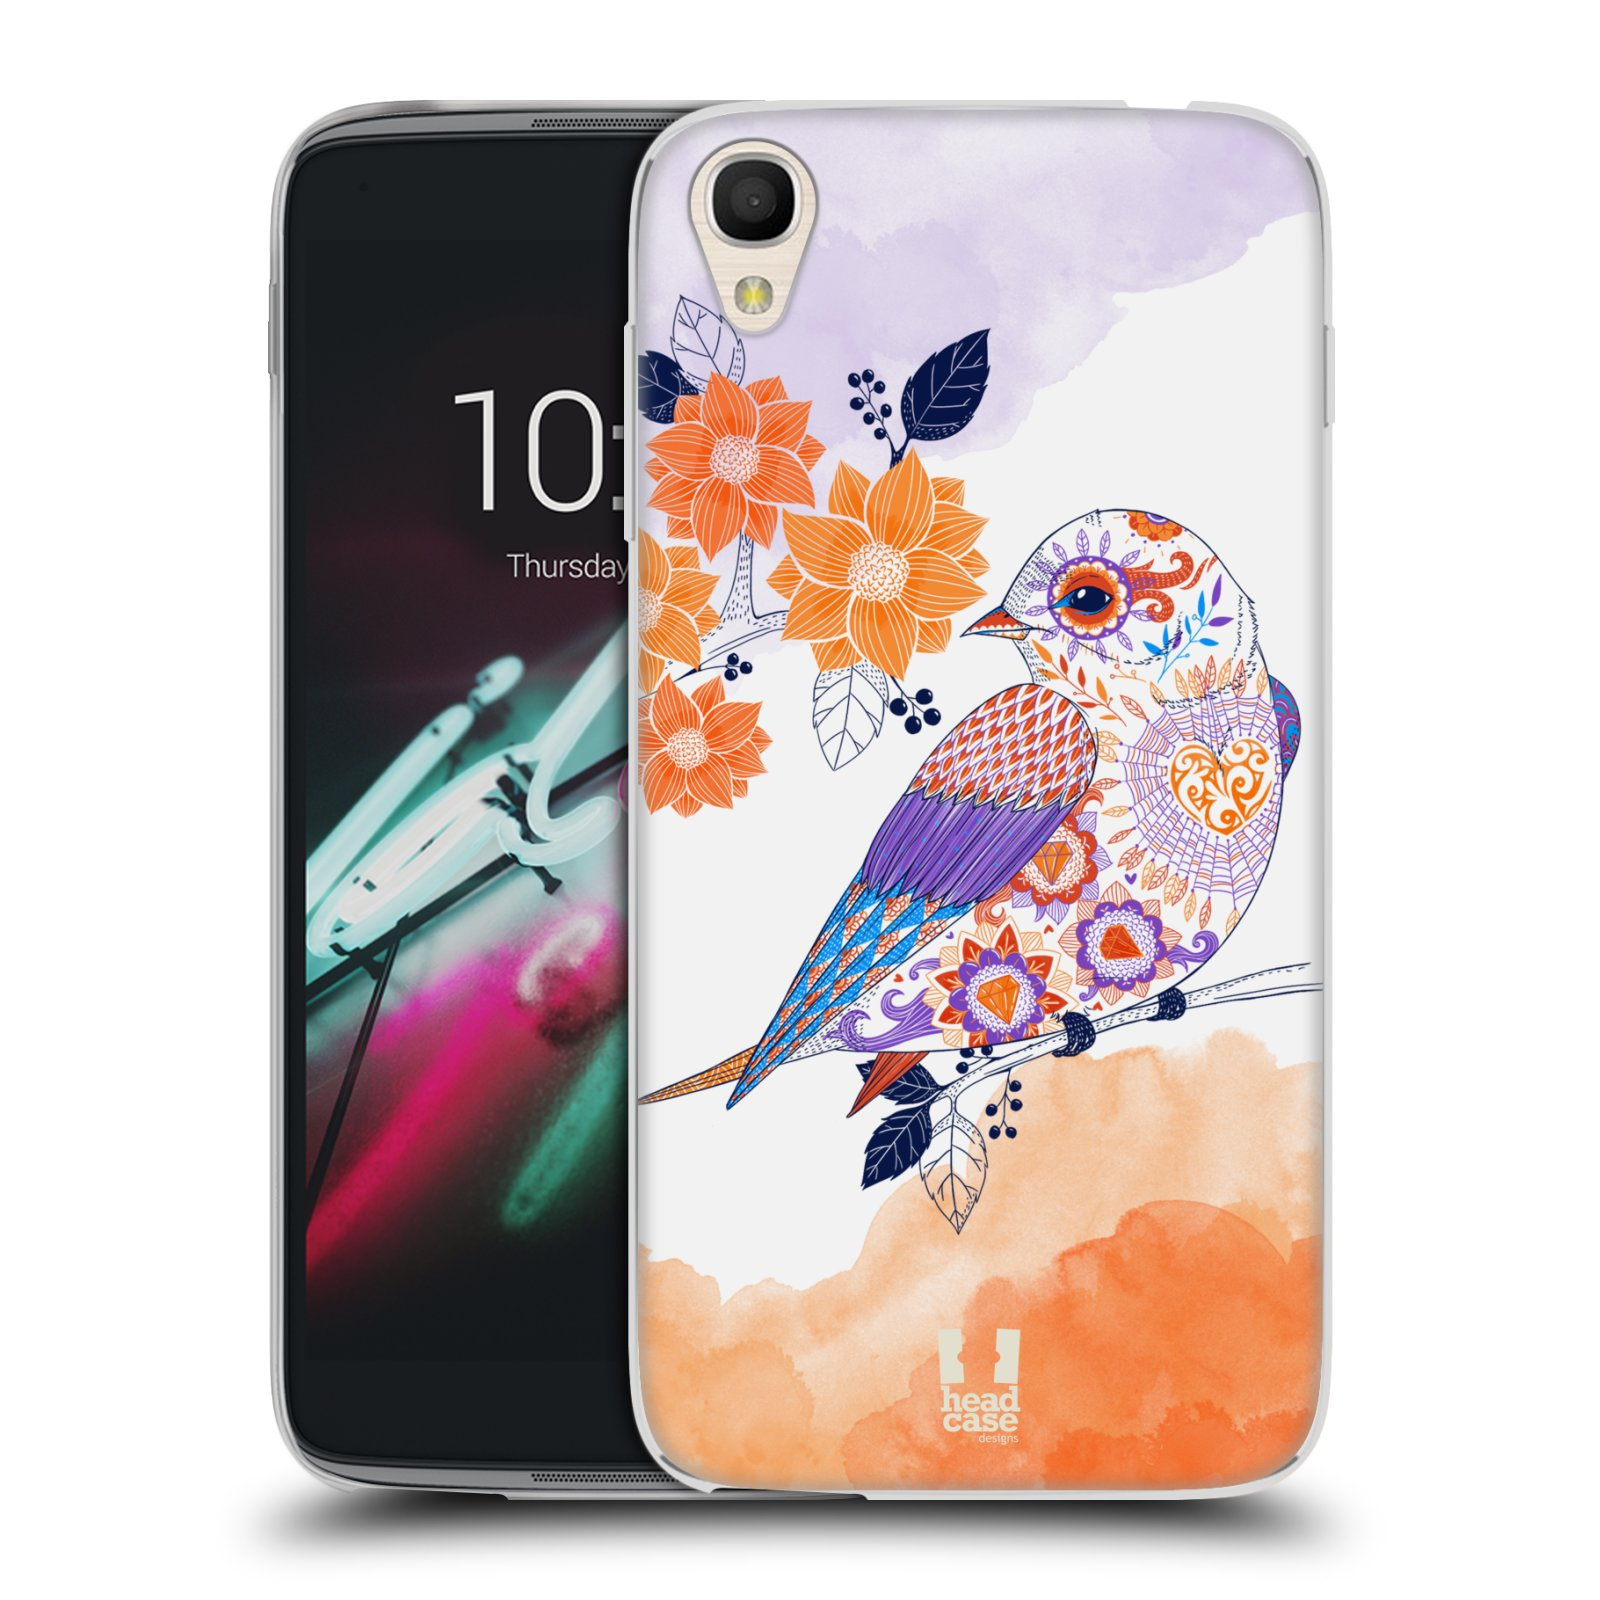 HEAD CASE silikonový obal na mobil Alcatel Idol 3 OT-6039Y (4.7) vzor Květina ptáčci ORANŽOVÁ